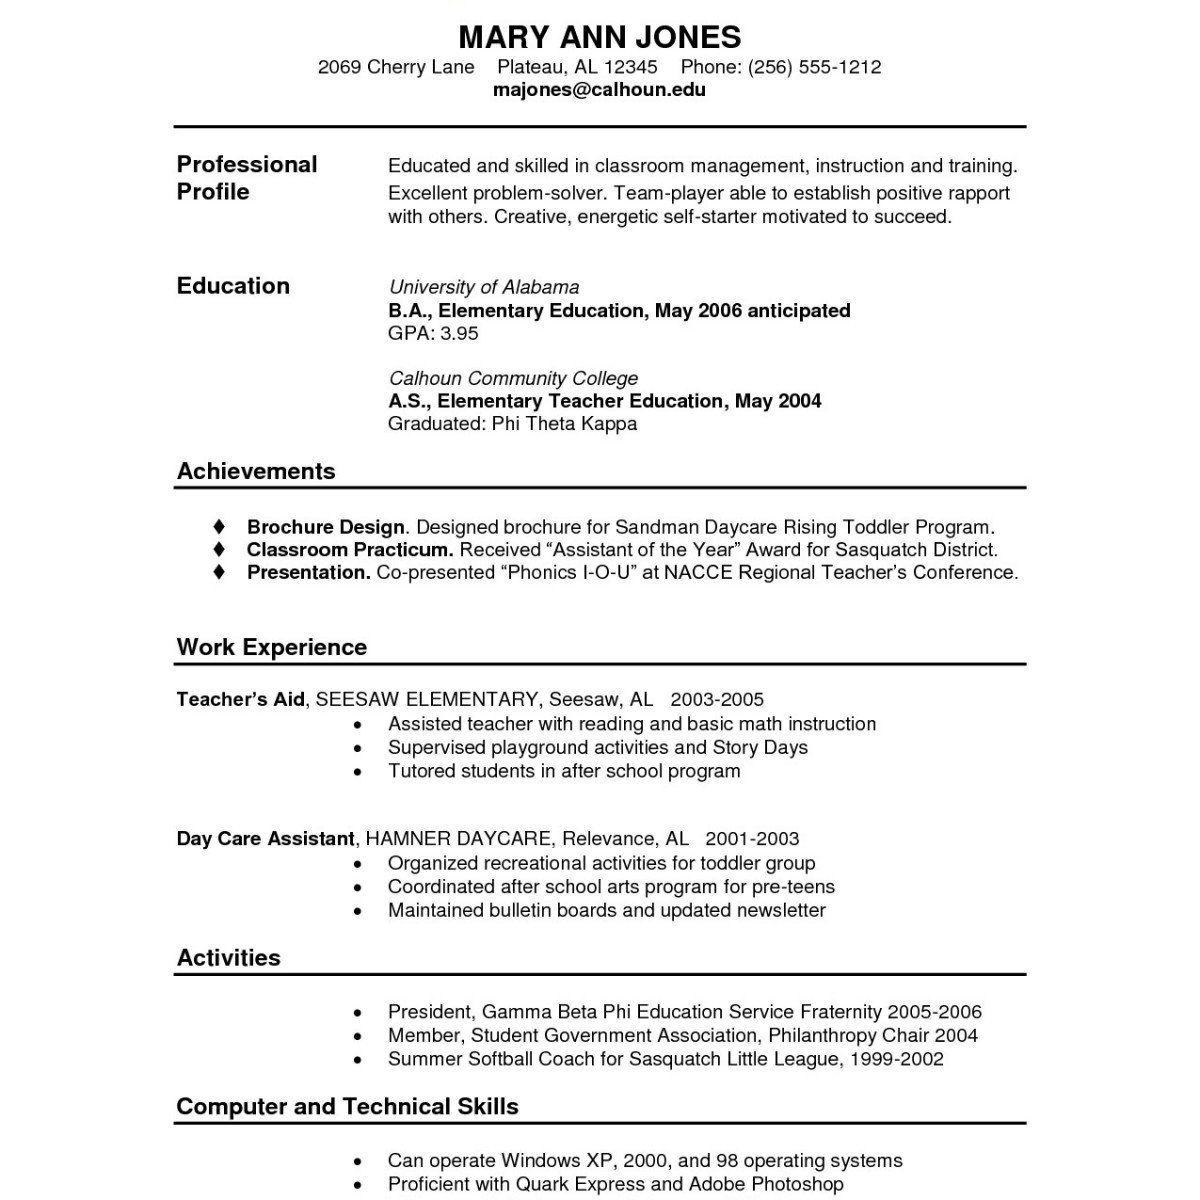 Sample Resume For Community College Teaching Position New 73 Functional Resume Sample Job Resume Examples College Brochure College Resume